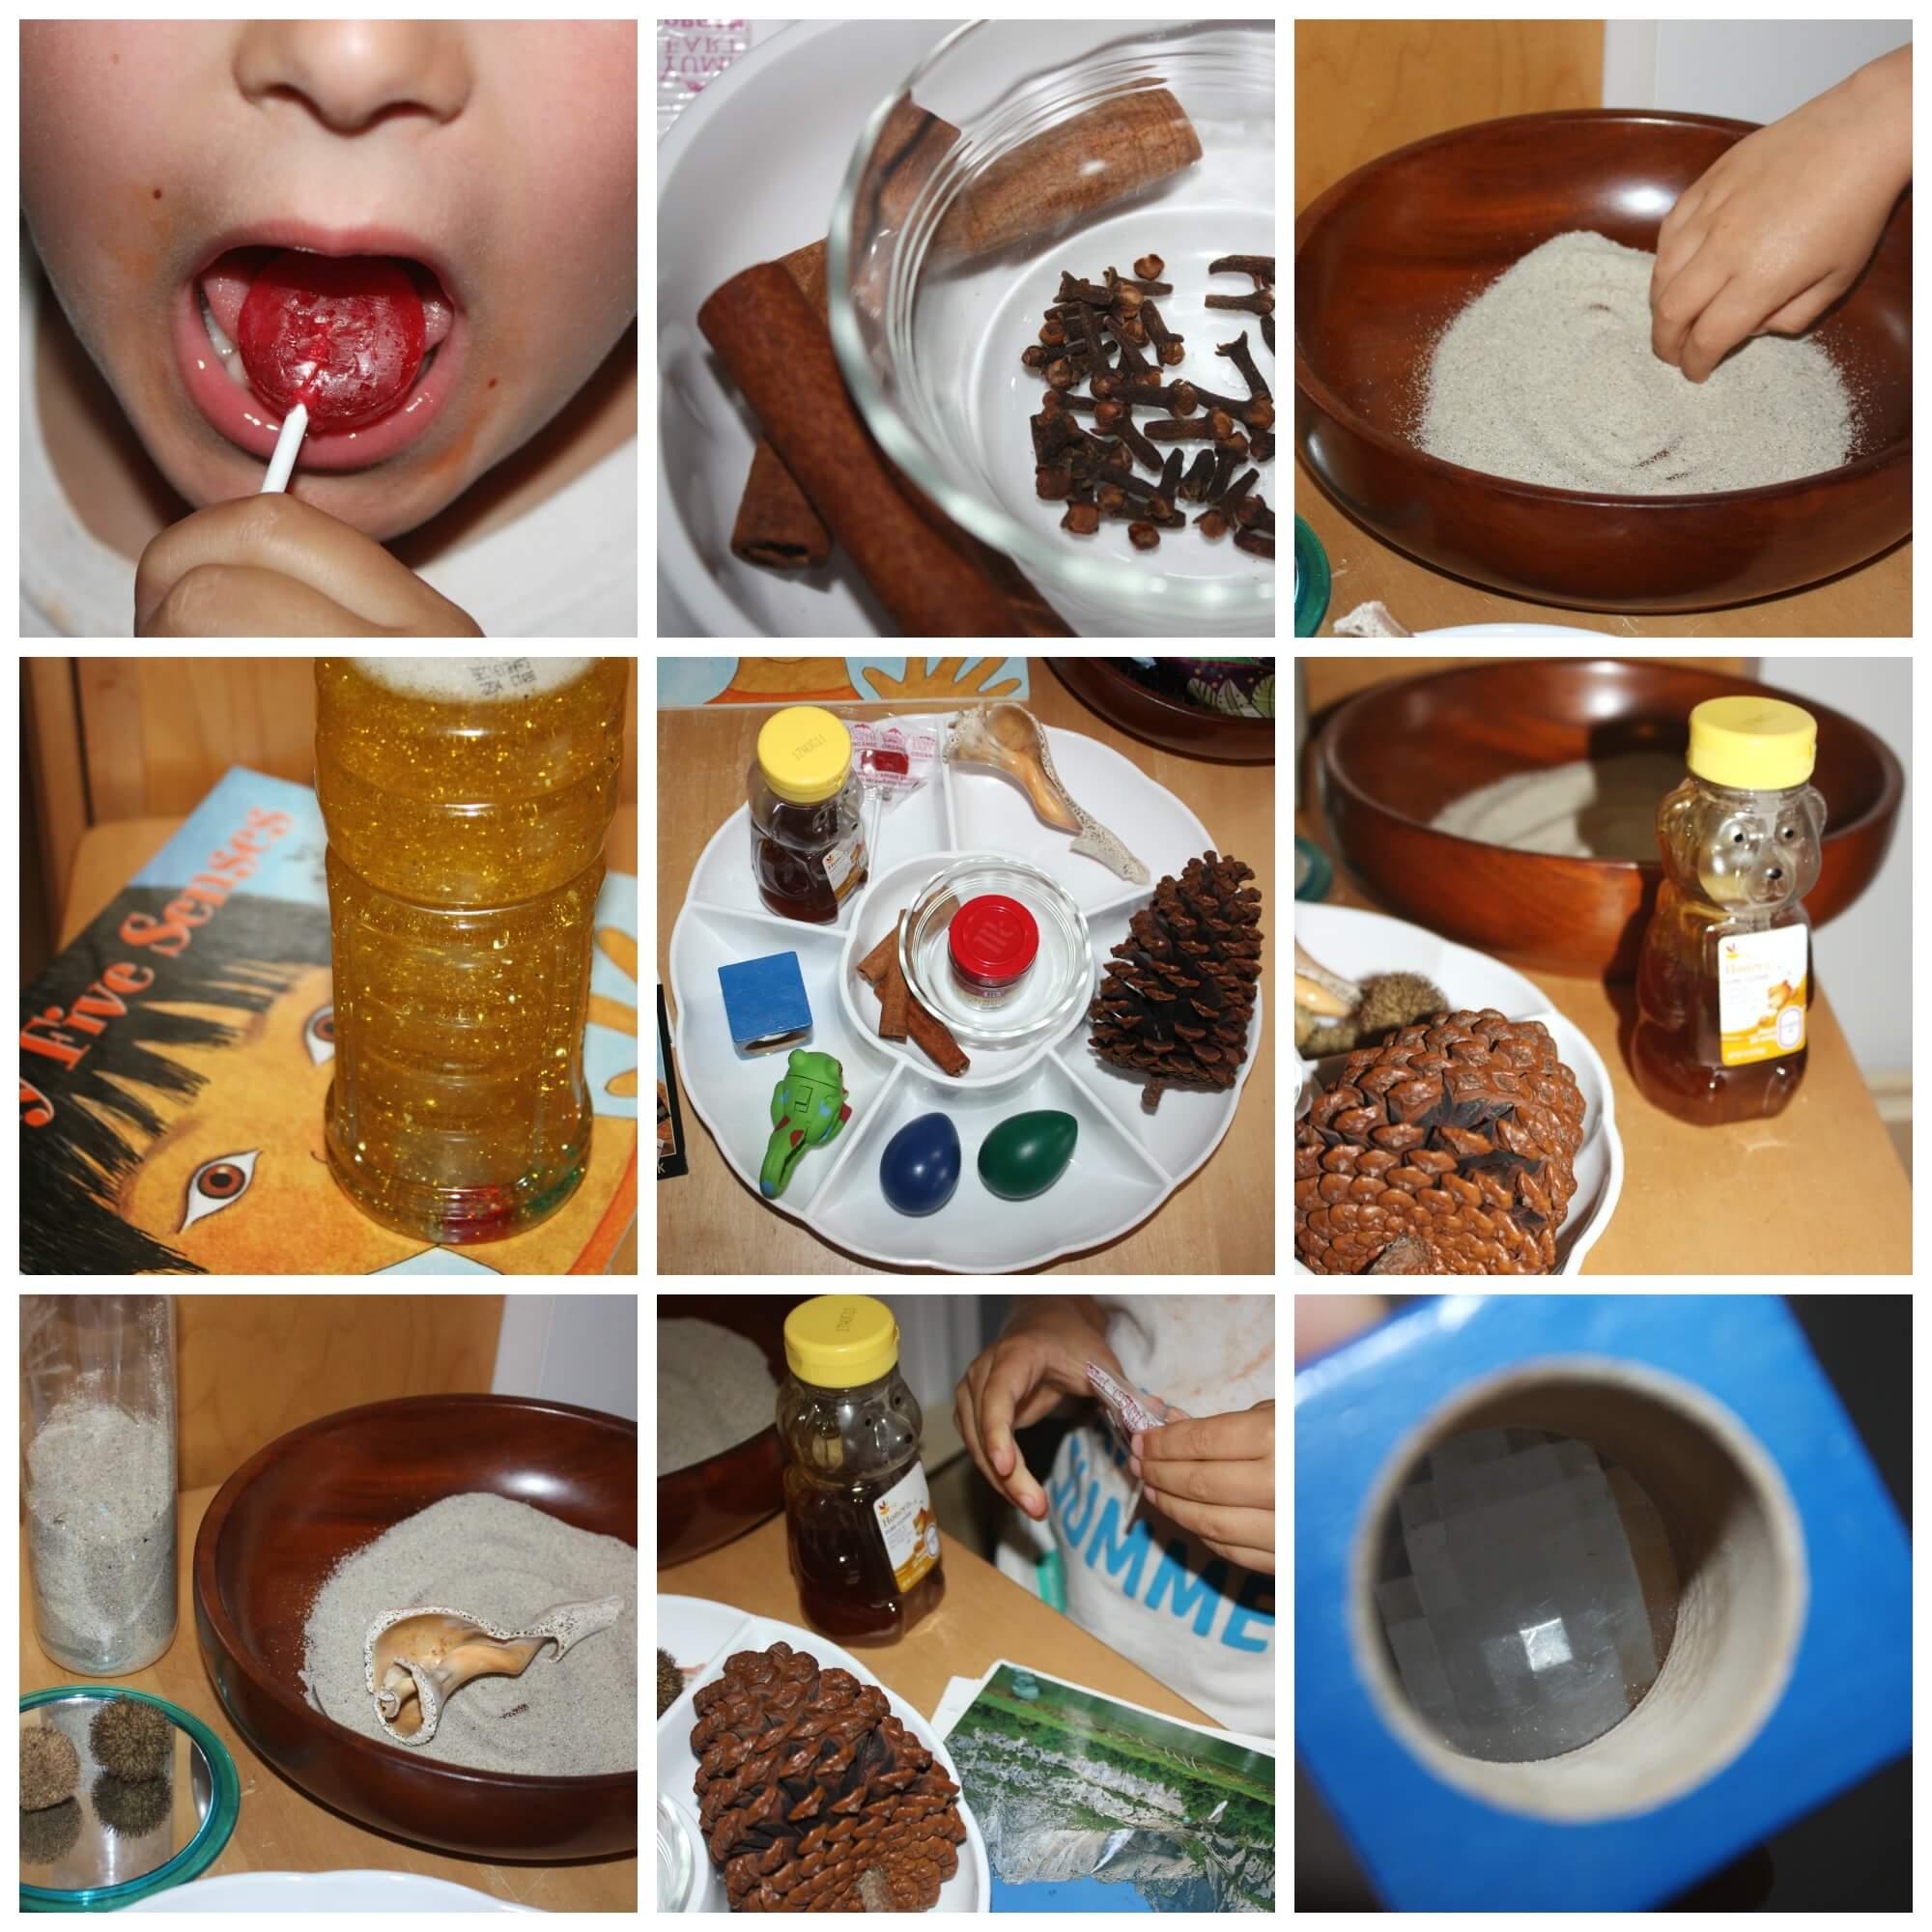 5 senses Activity Preschool Learning About Senses Science